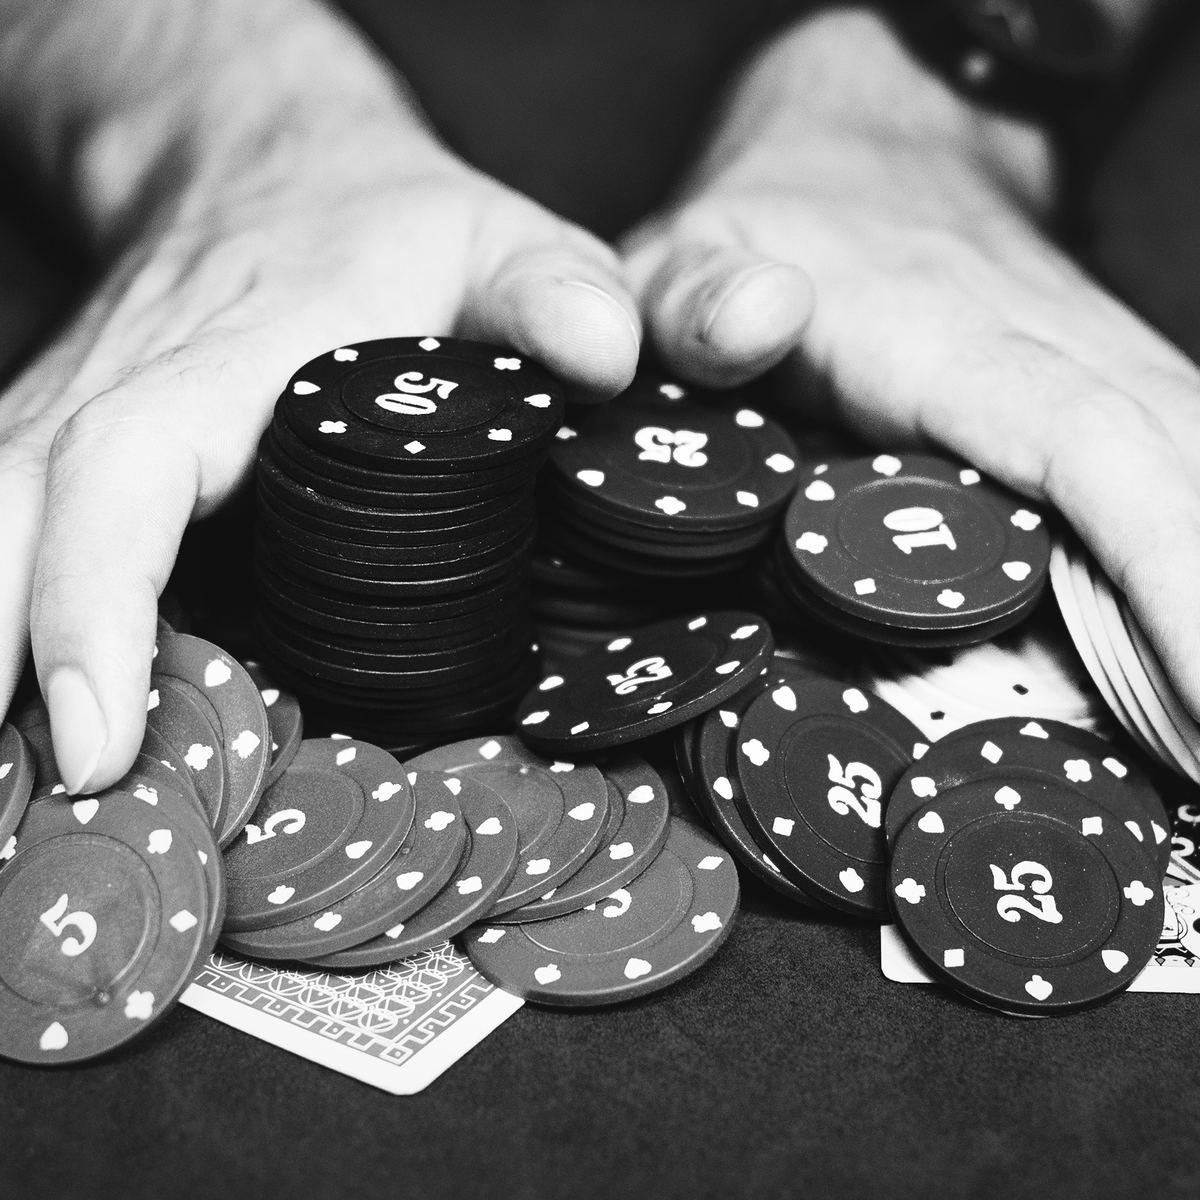 poker hand kaggle